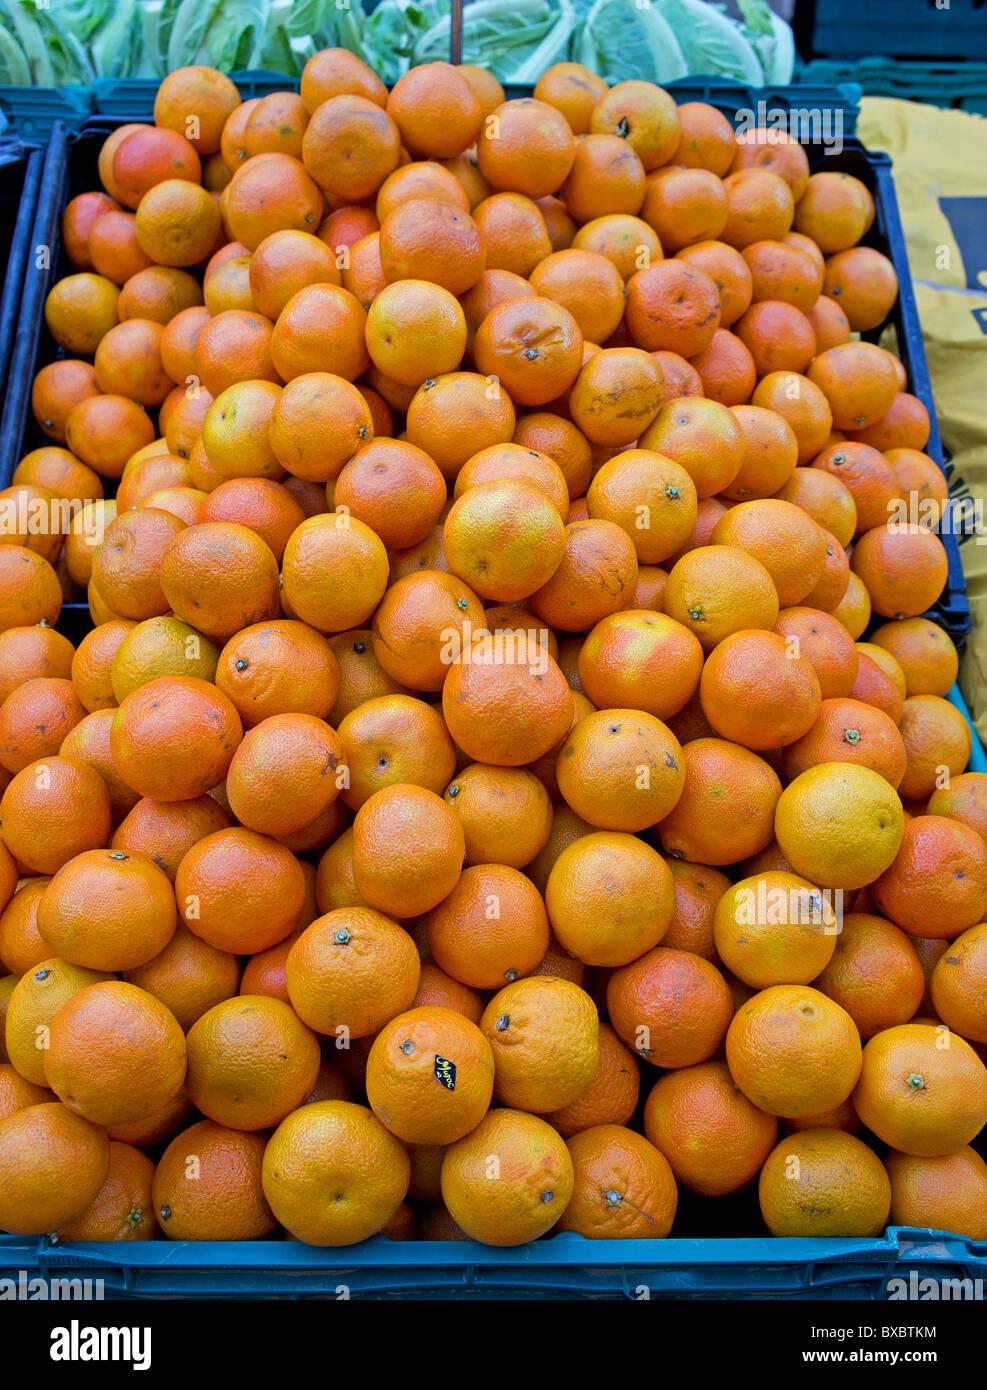 satsumas on a market stall, UK - Stock Image